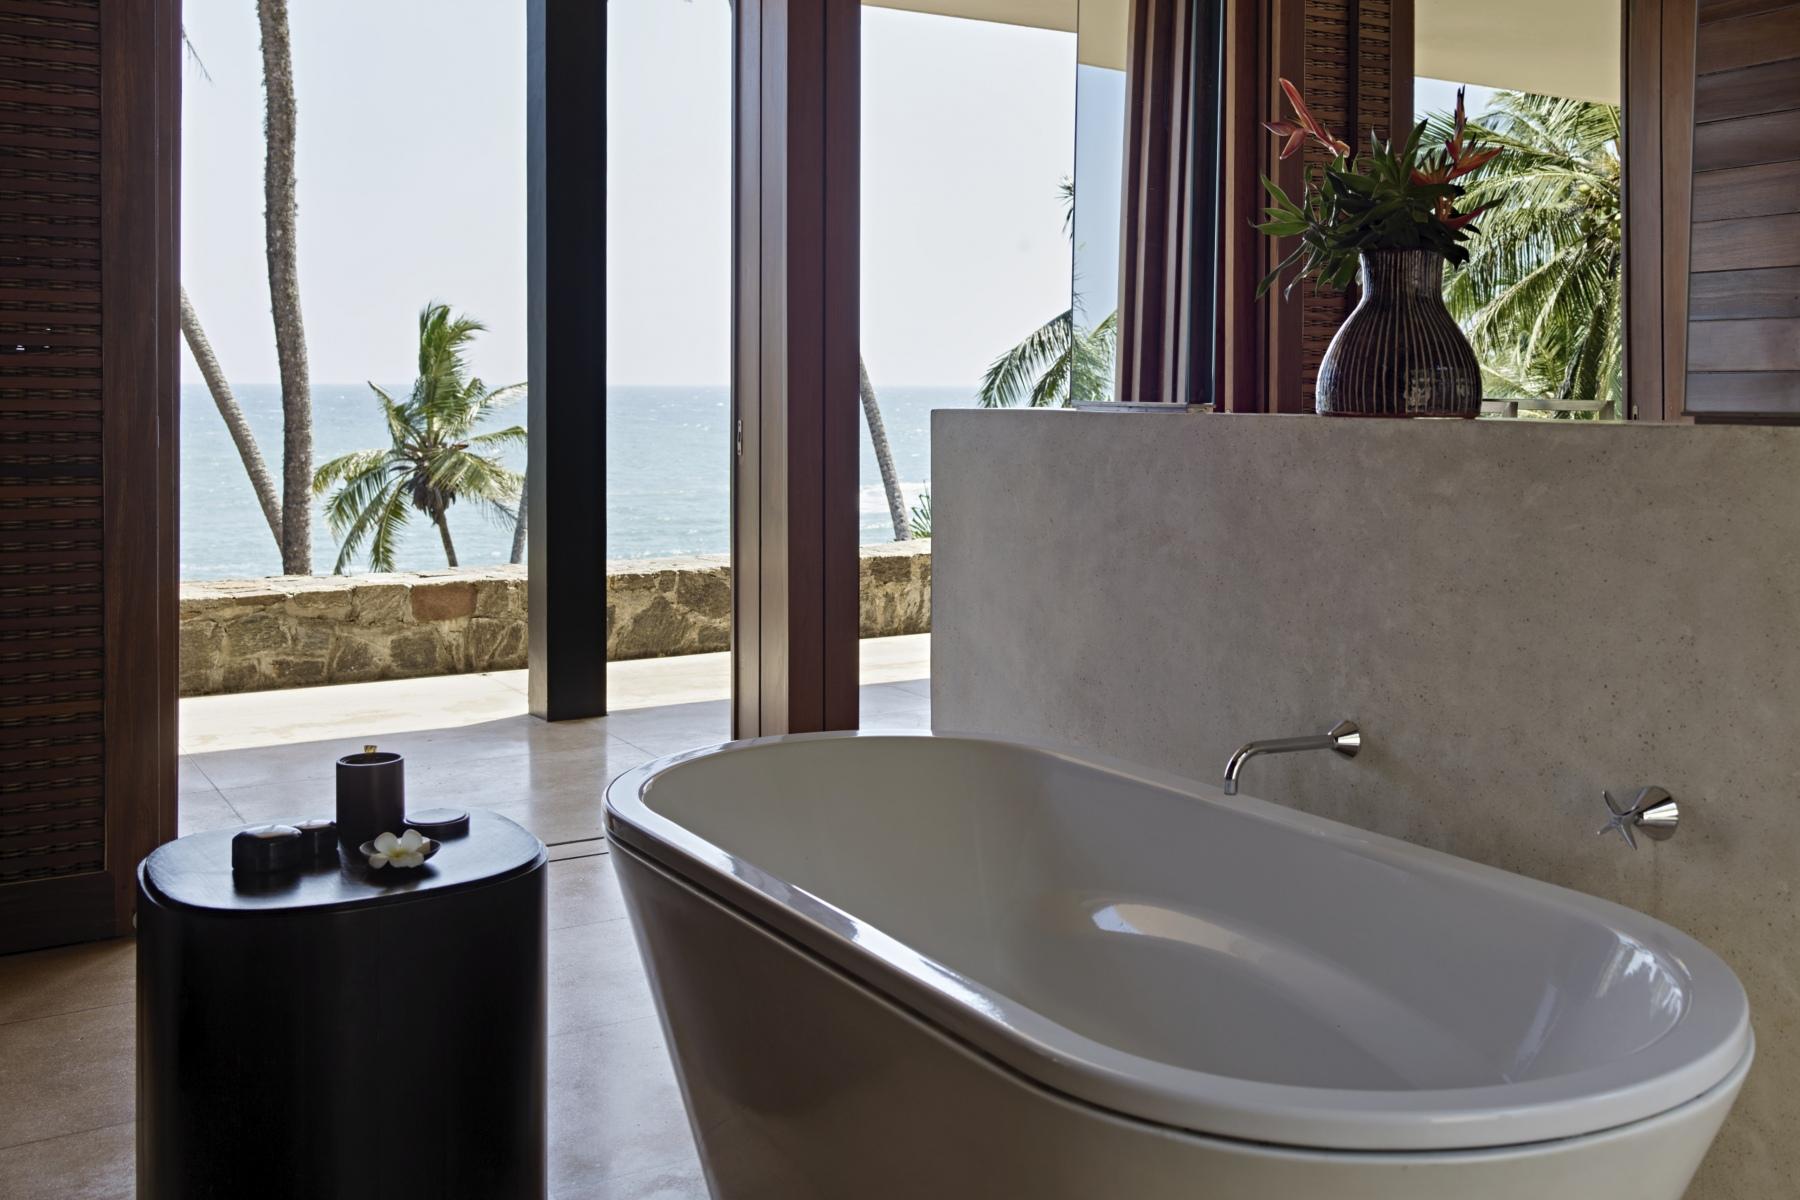 Amanwella, Sri Lanka - suite, bathtub, ocean view.tif